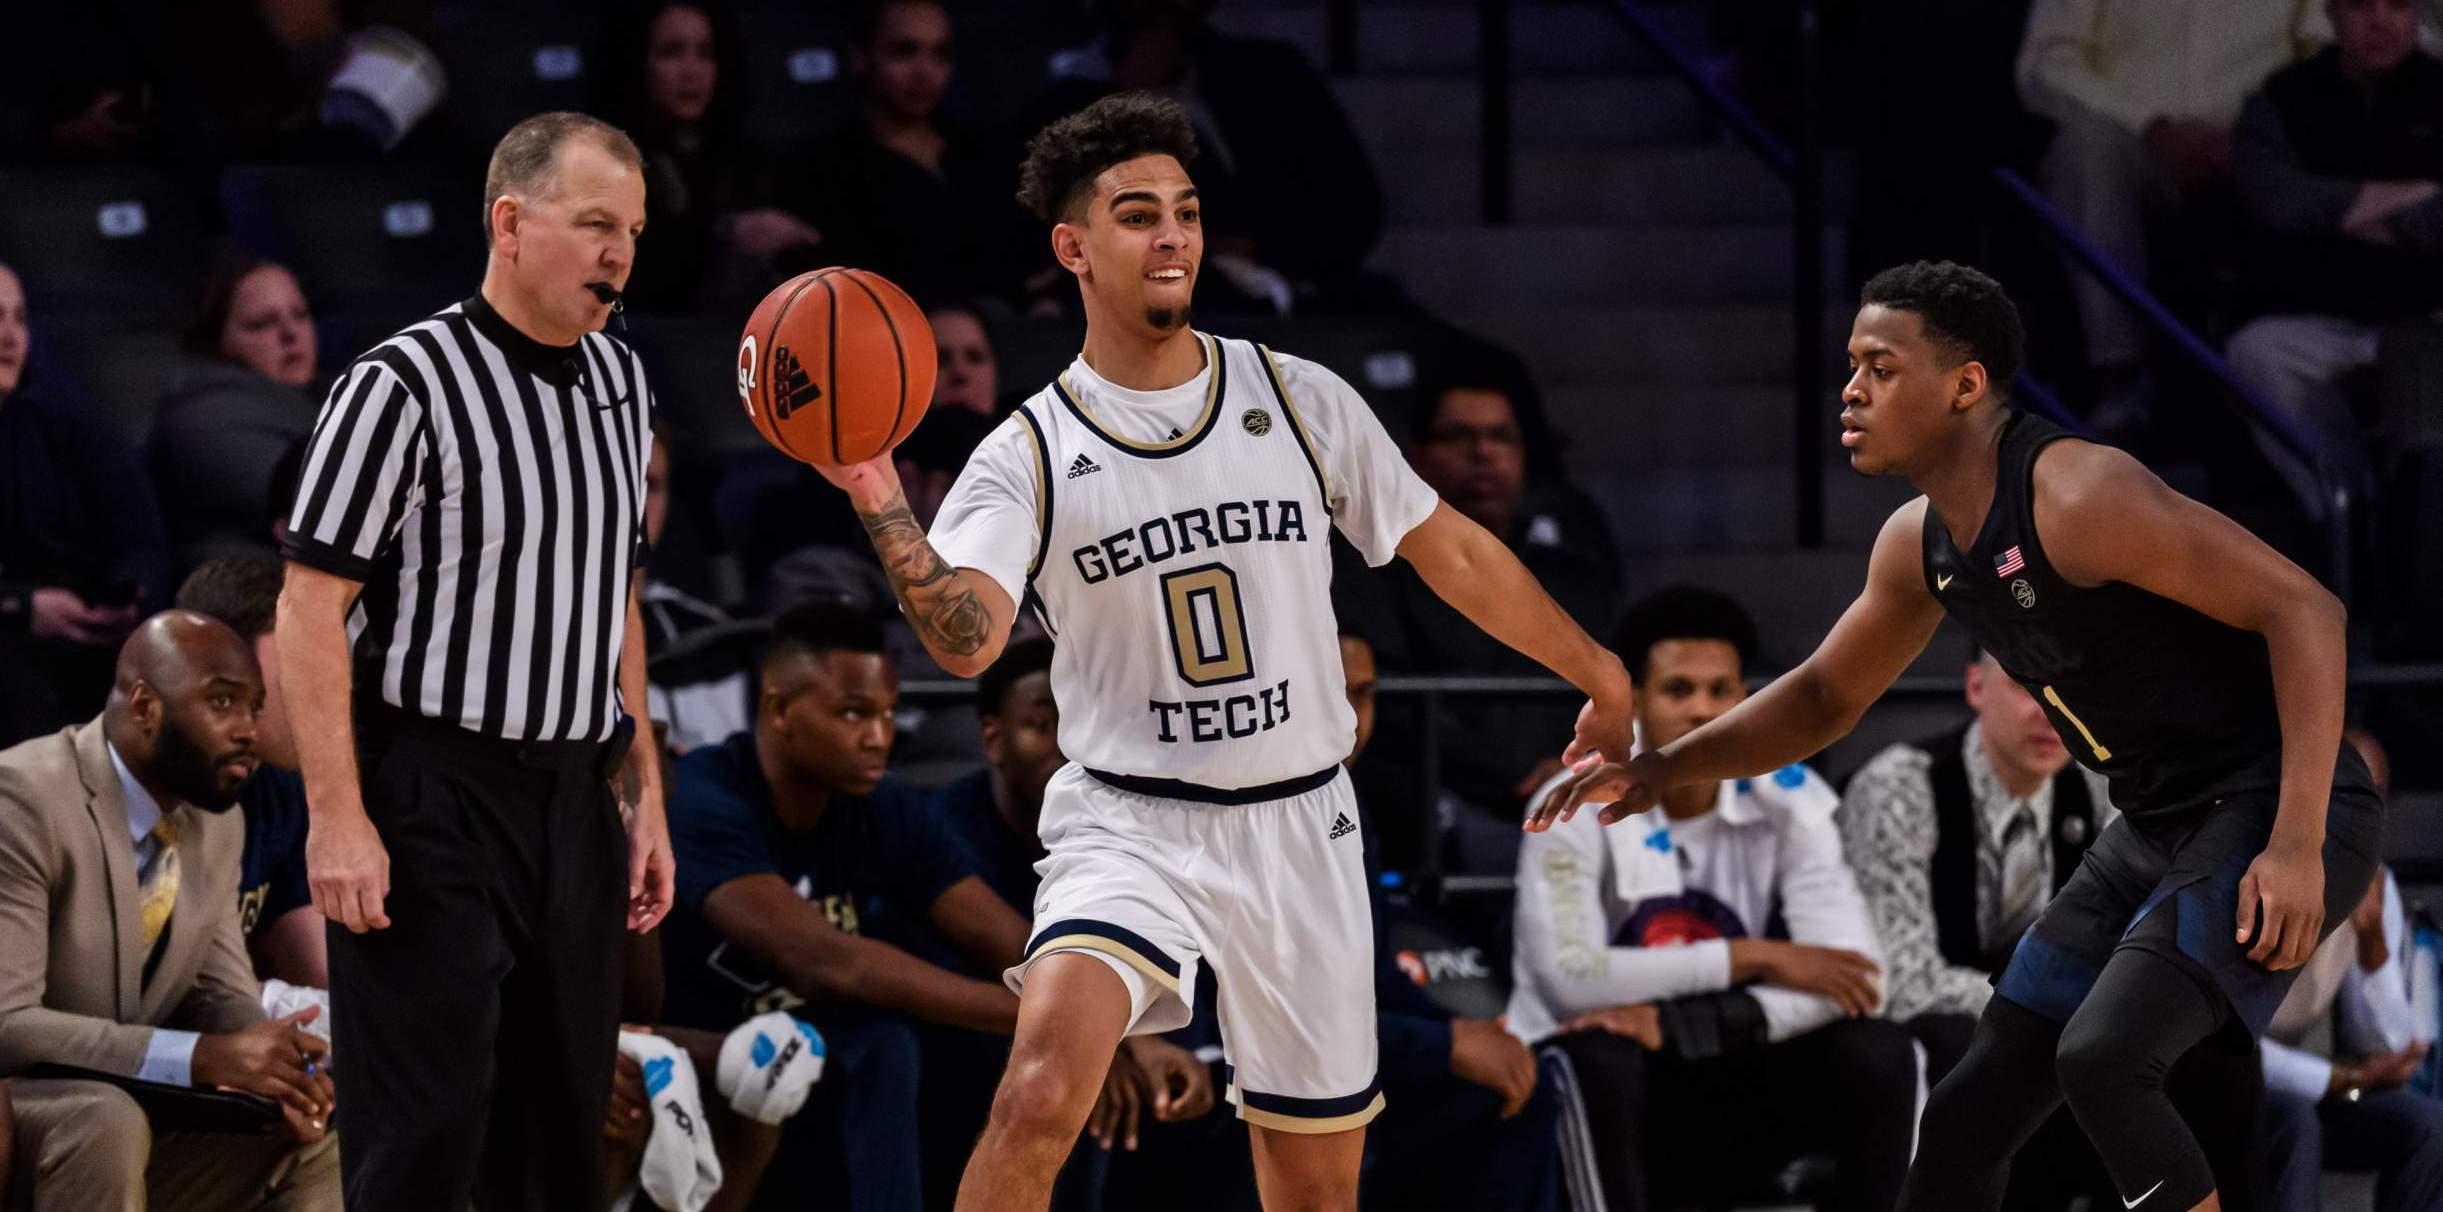 Georgia Tech Basketball Travels To Face Miami Men S Basketball